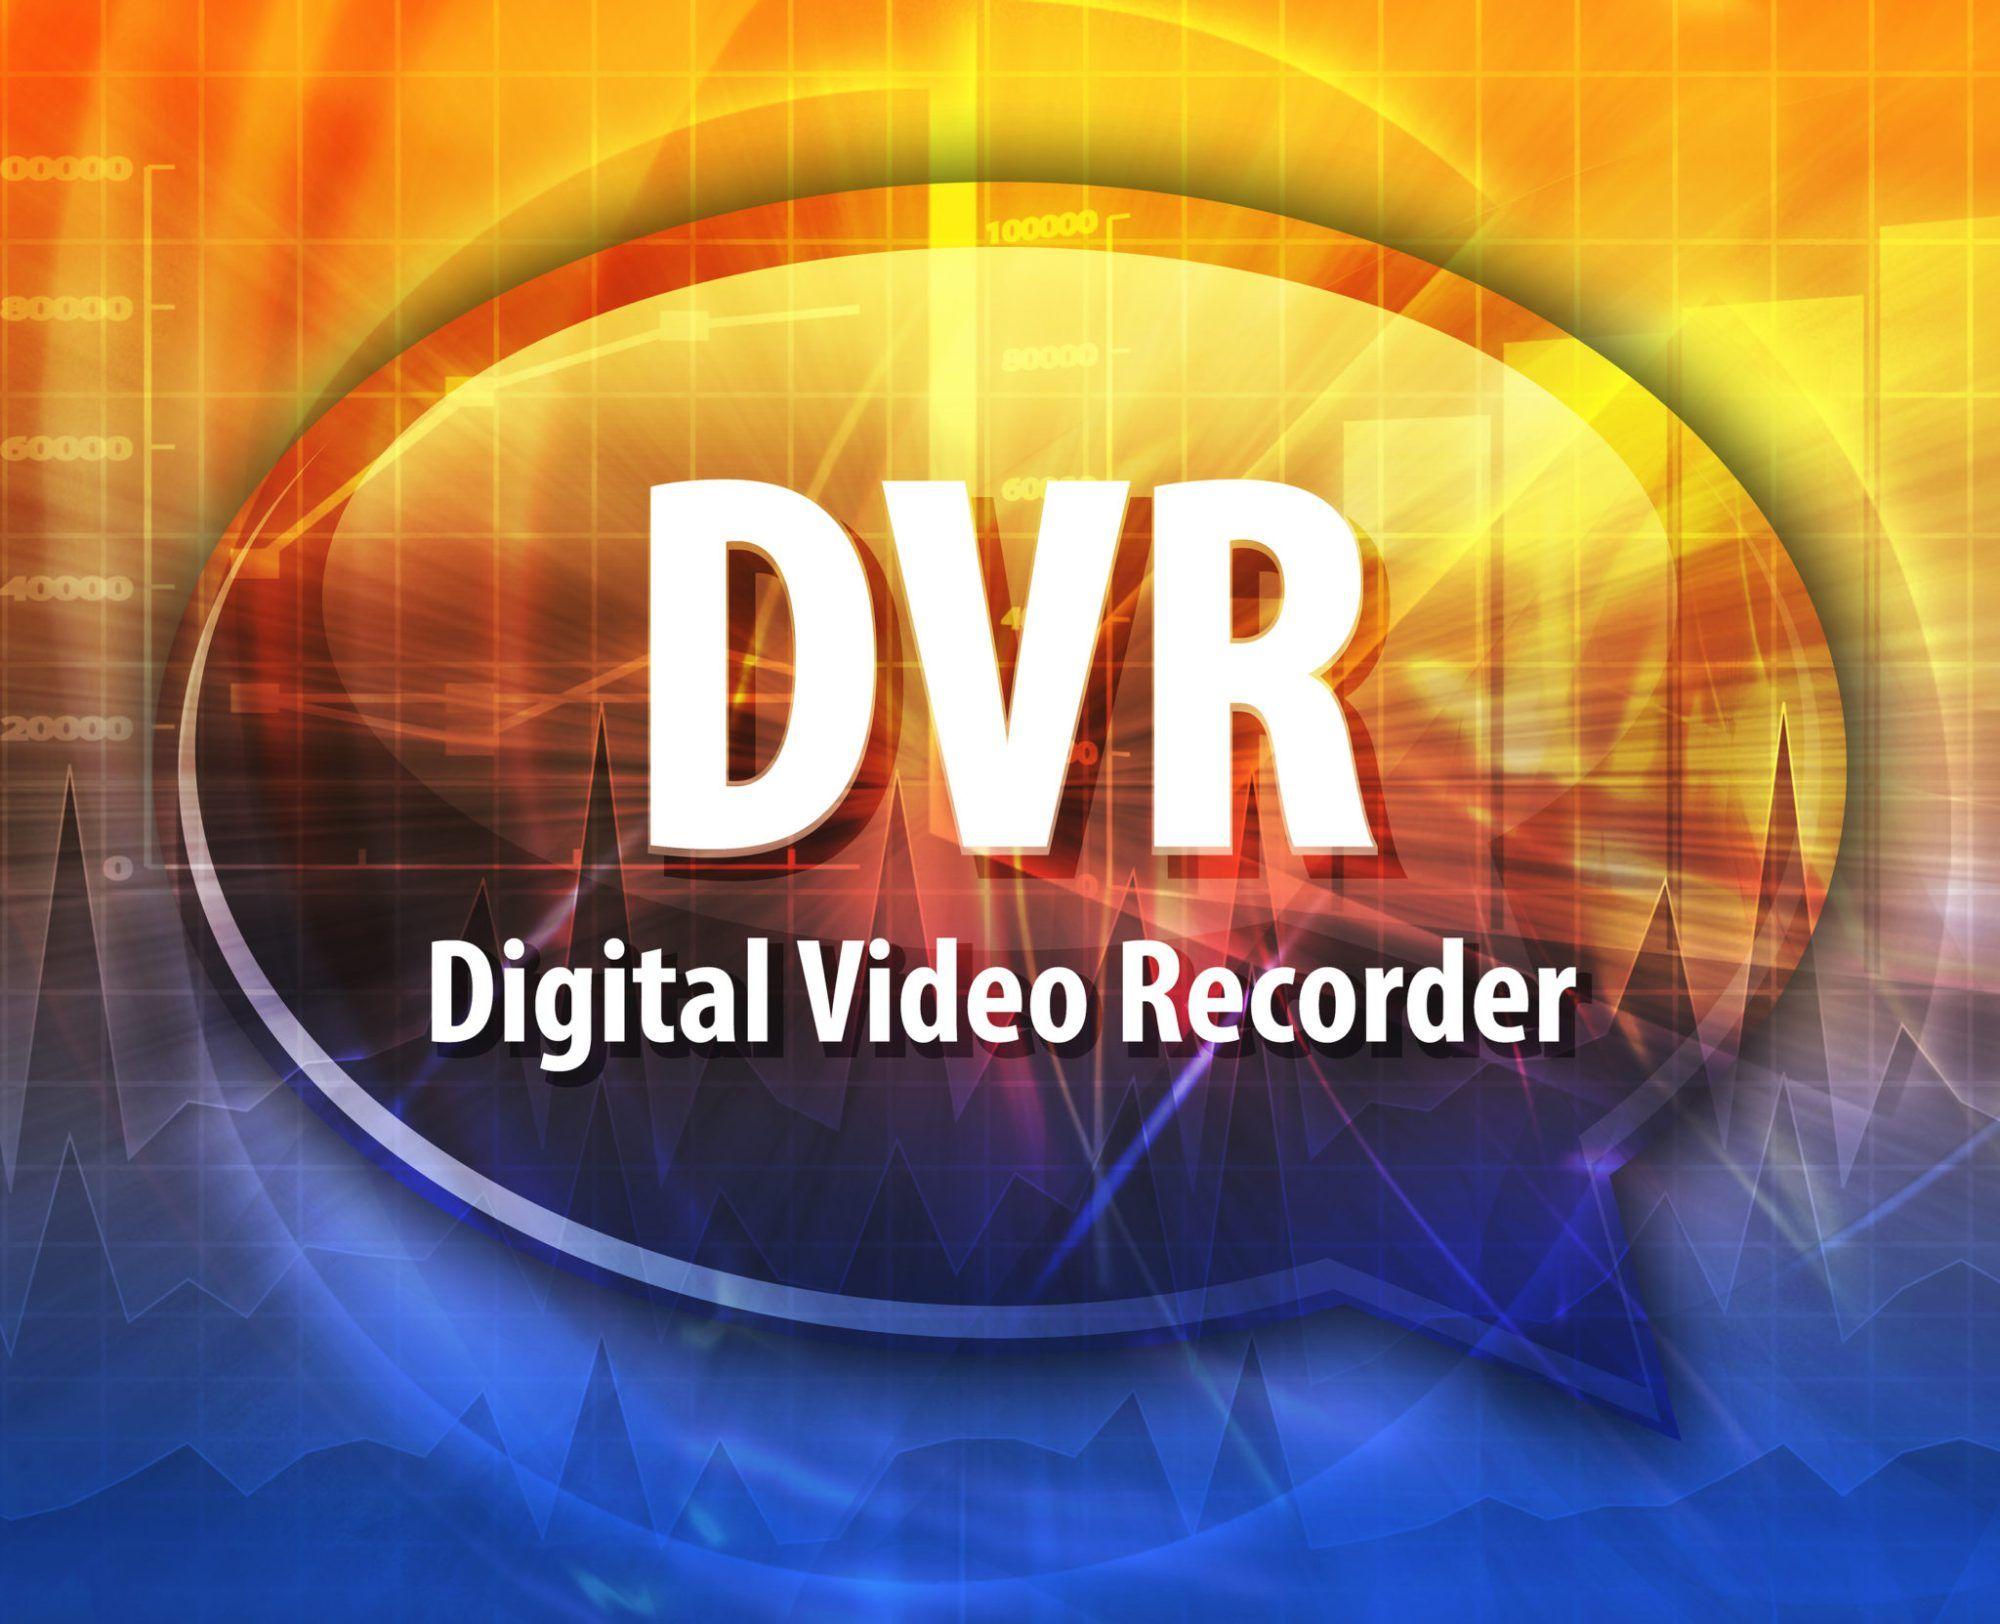 Digitаl Vidео Rесоrdеr Evolution Home Security and